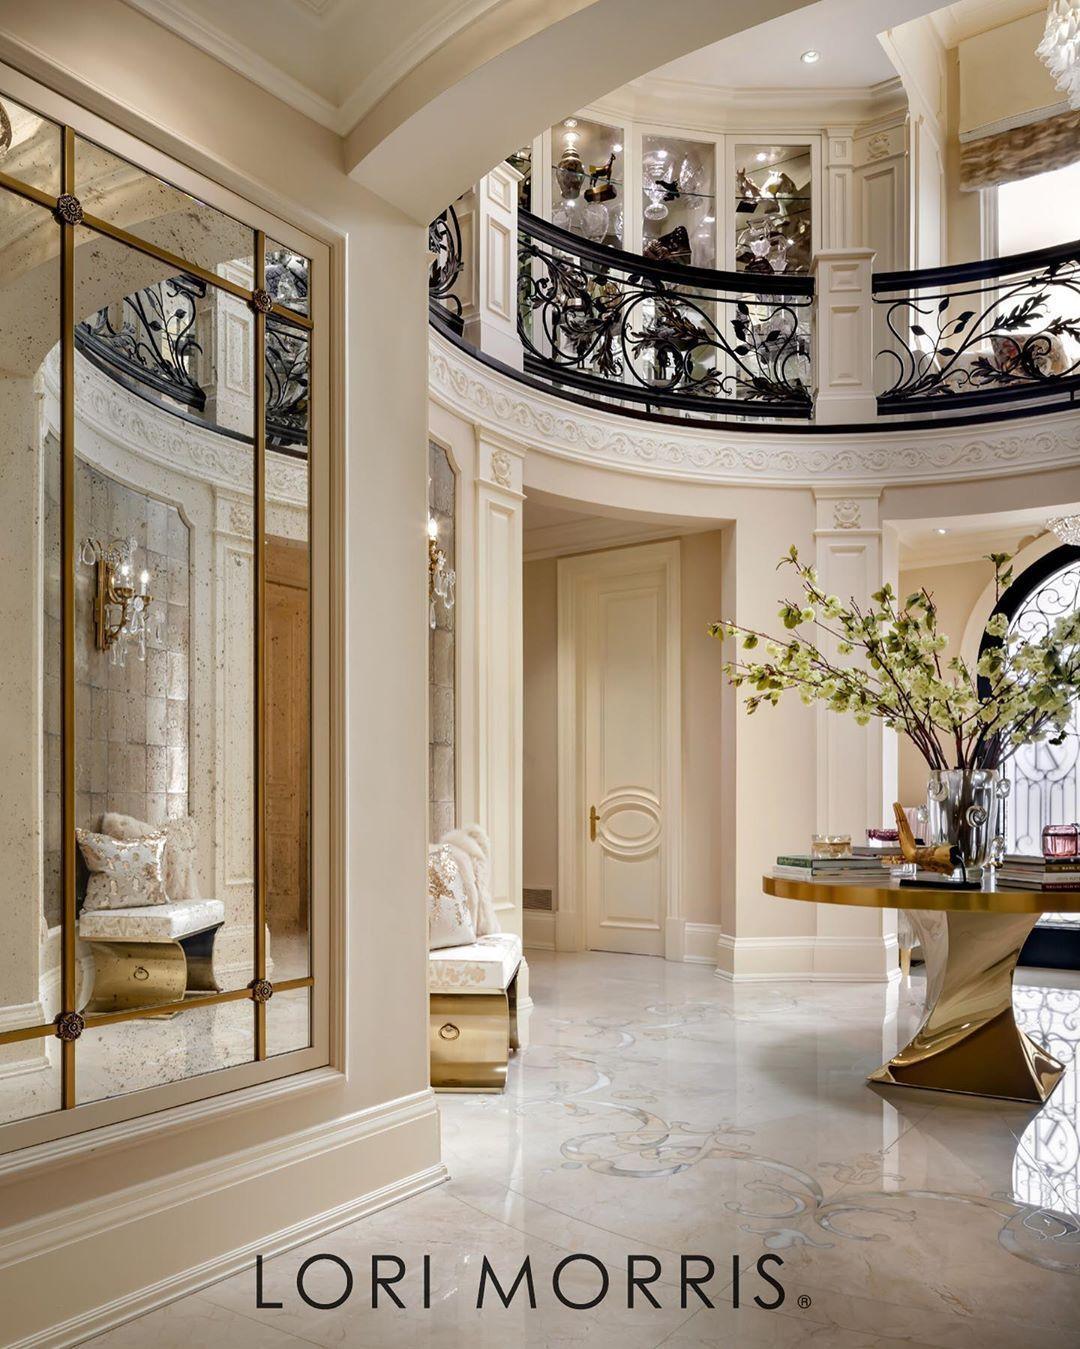 Top Interior Designers Lori Morris House Of Ldm Top Interior